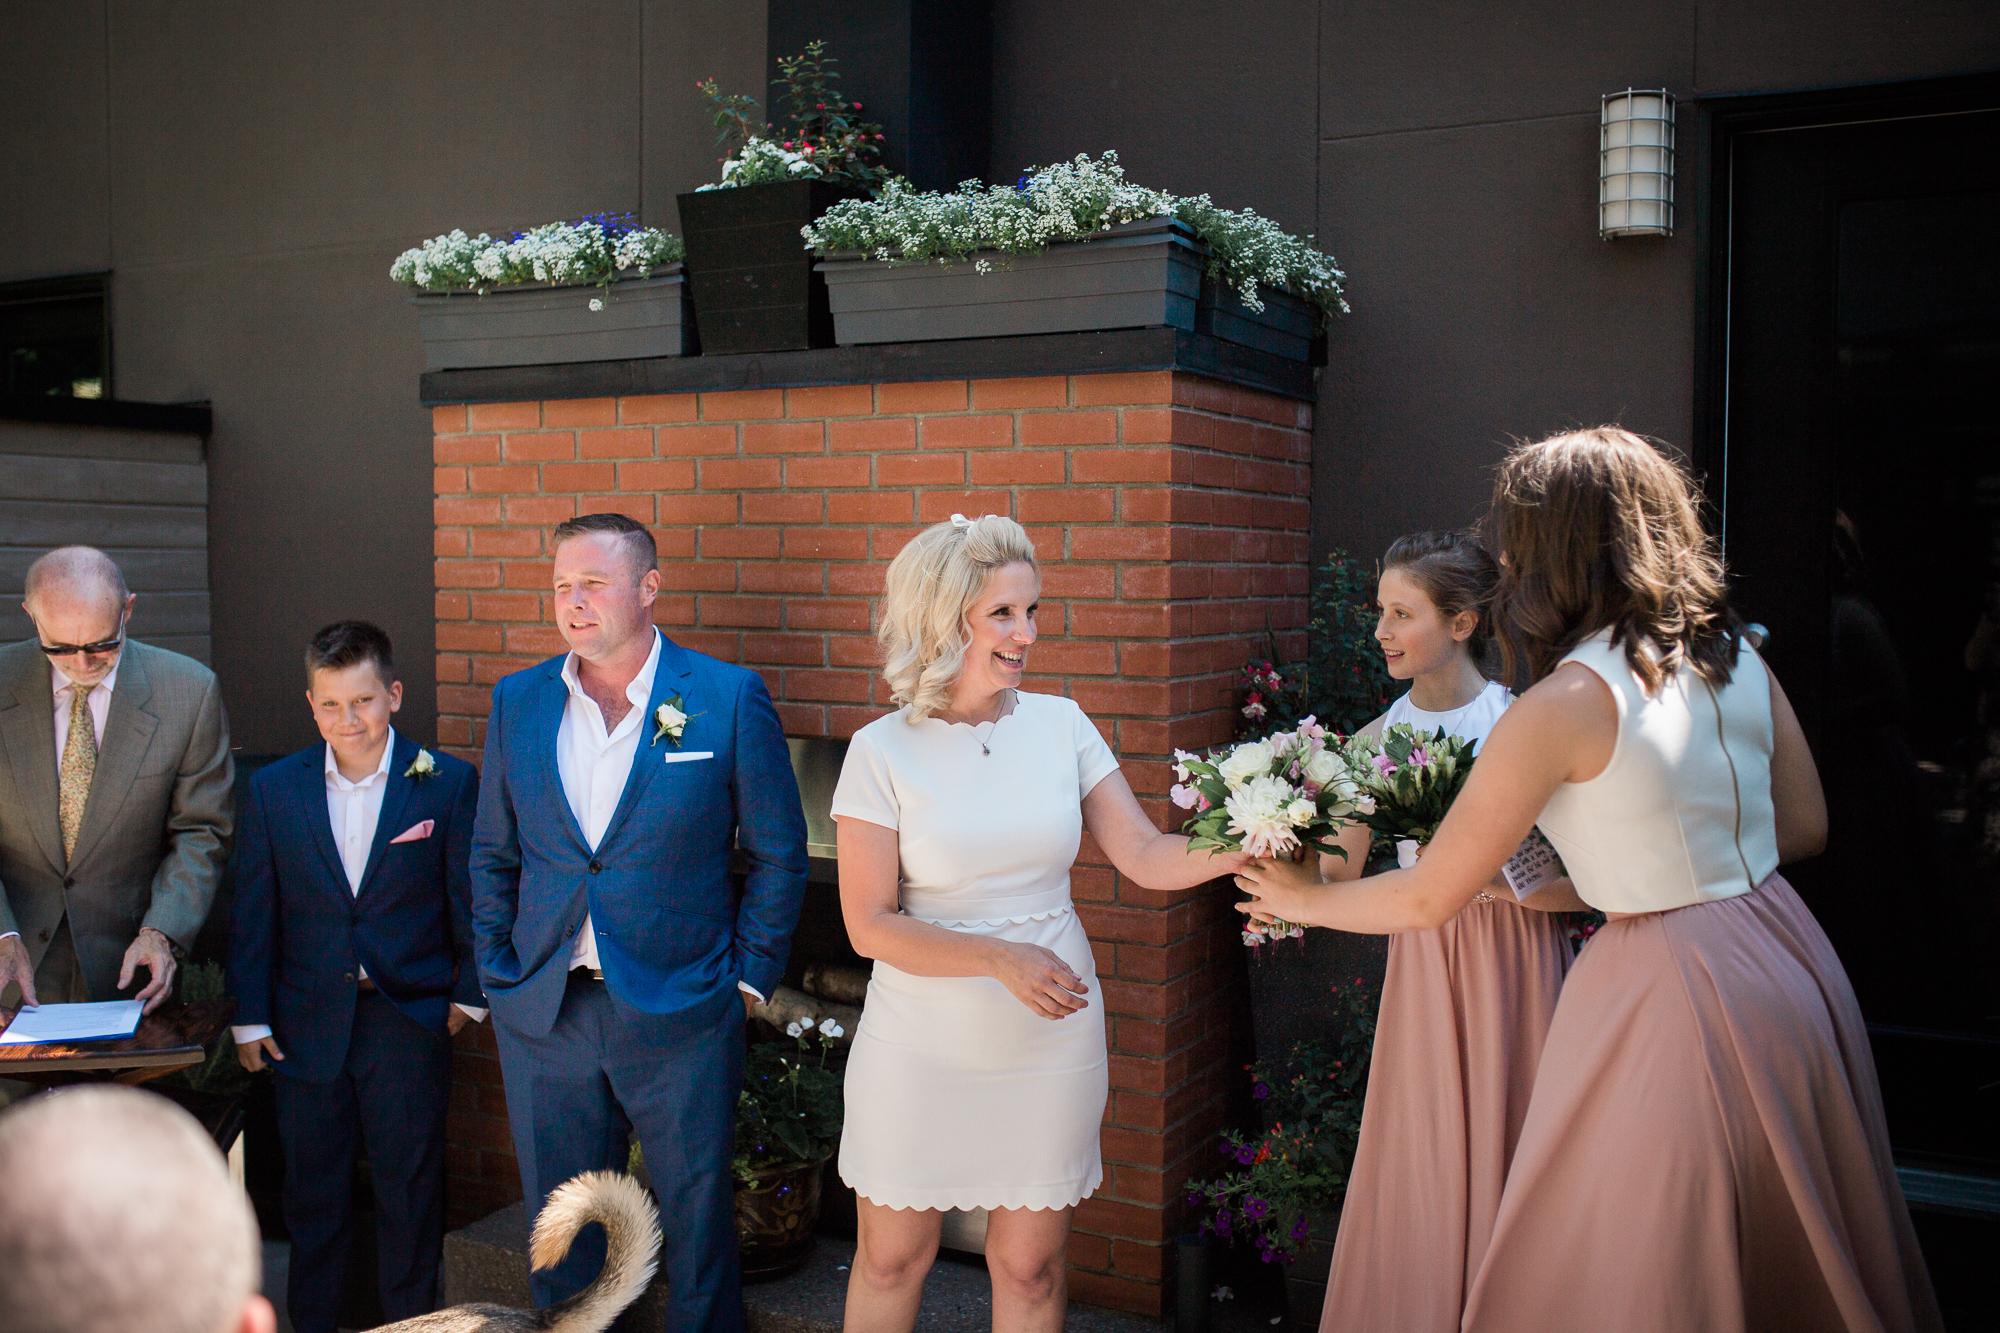 Calgary-wedding-photographer-CG-21.jpg